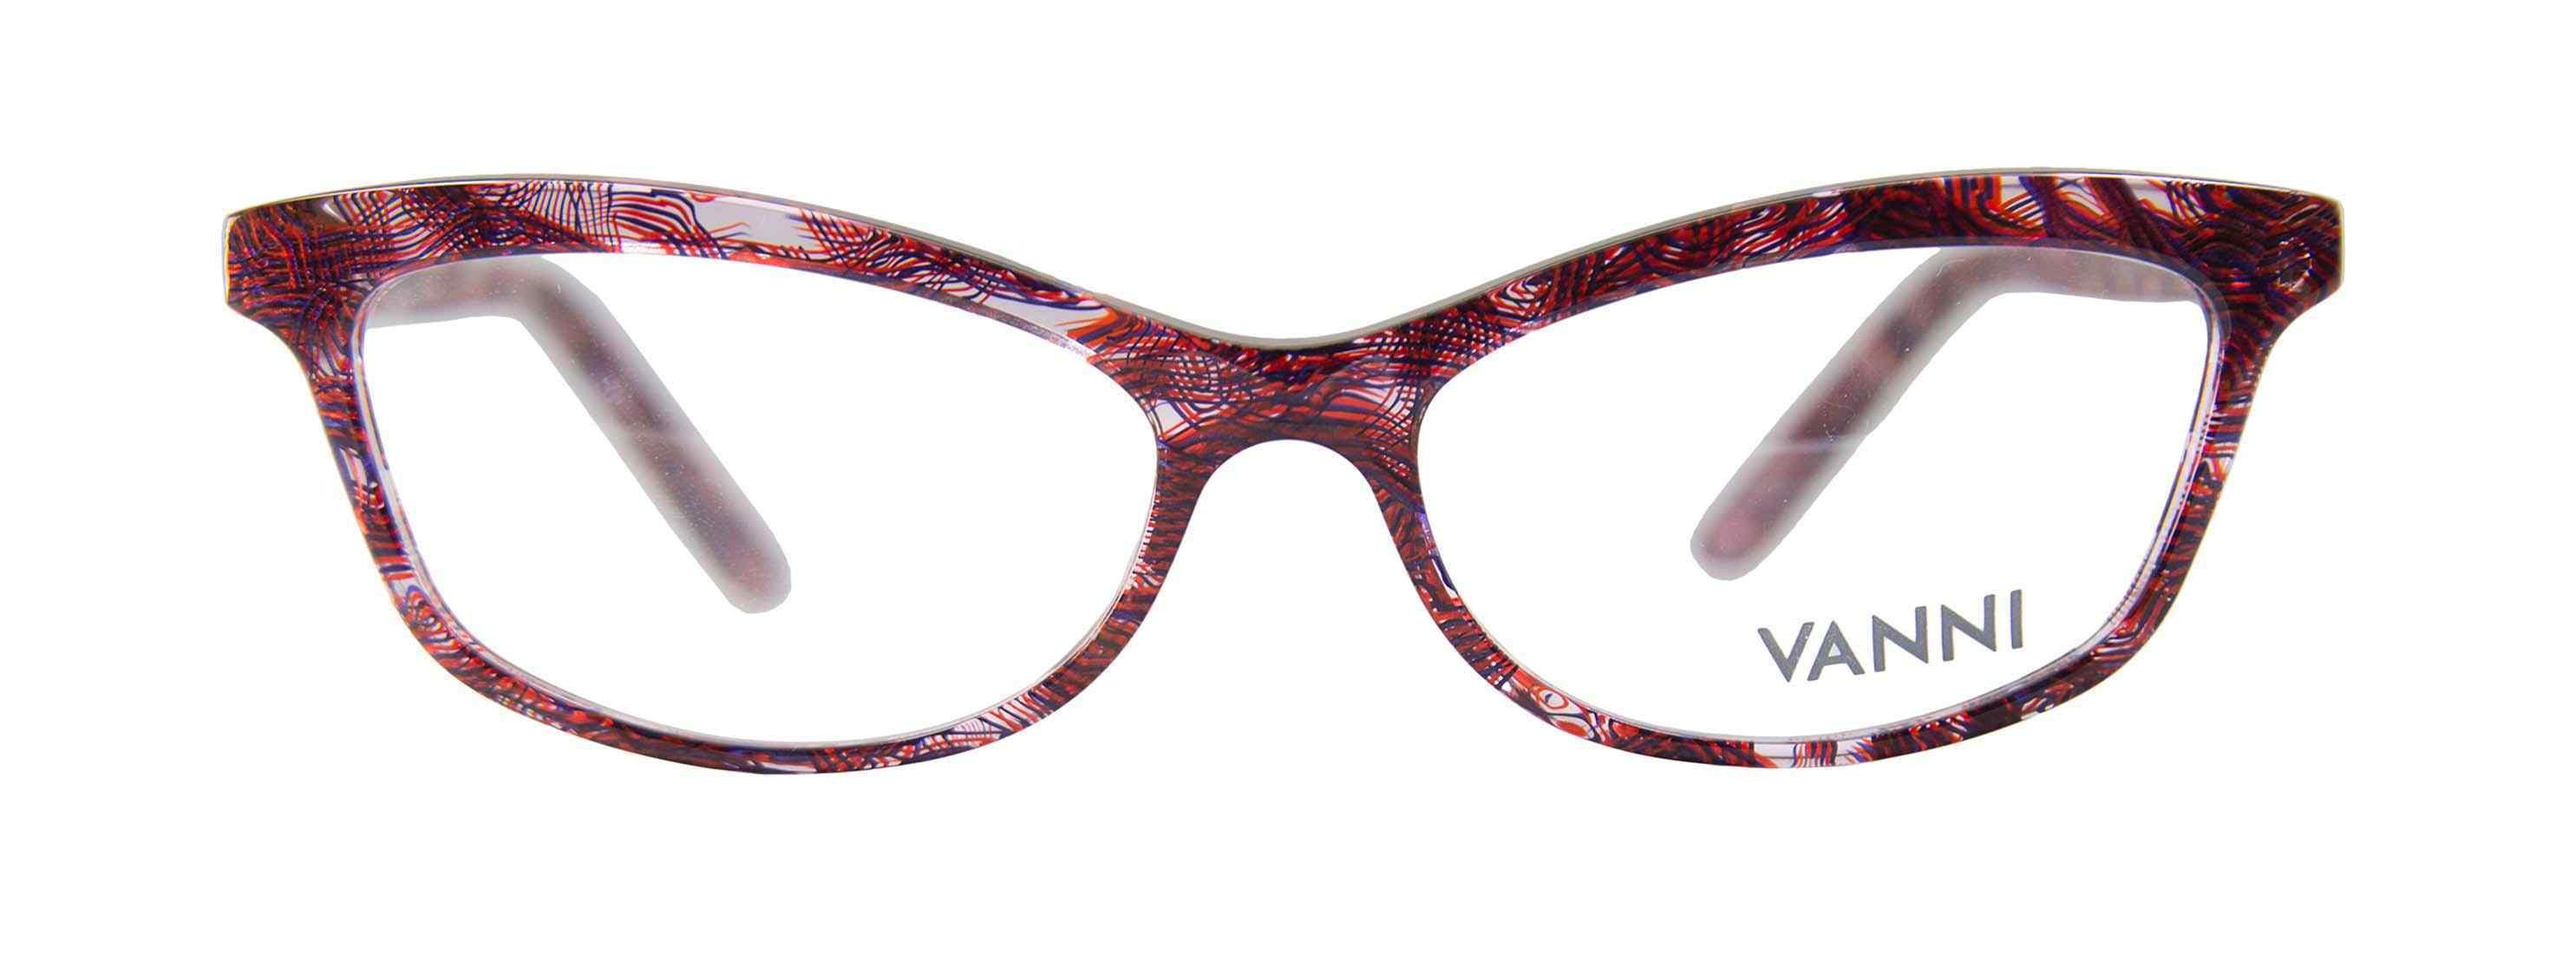 Vanni spectacles 1254 A215 0 2970x1100